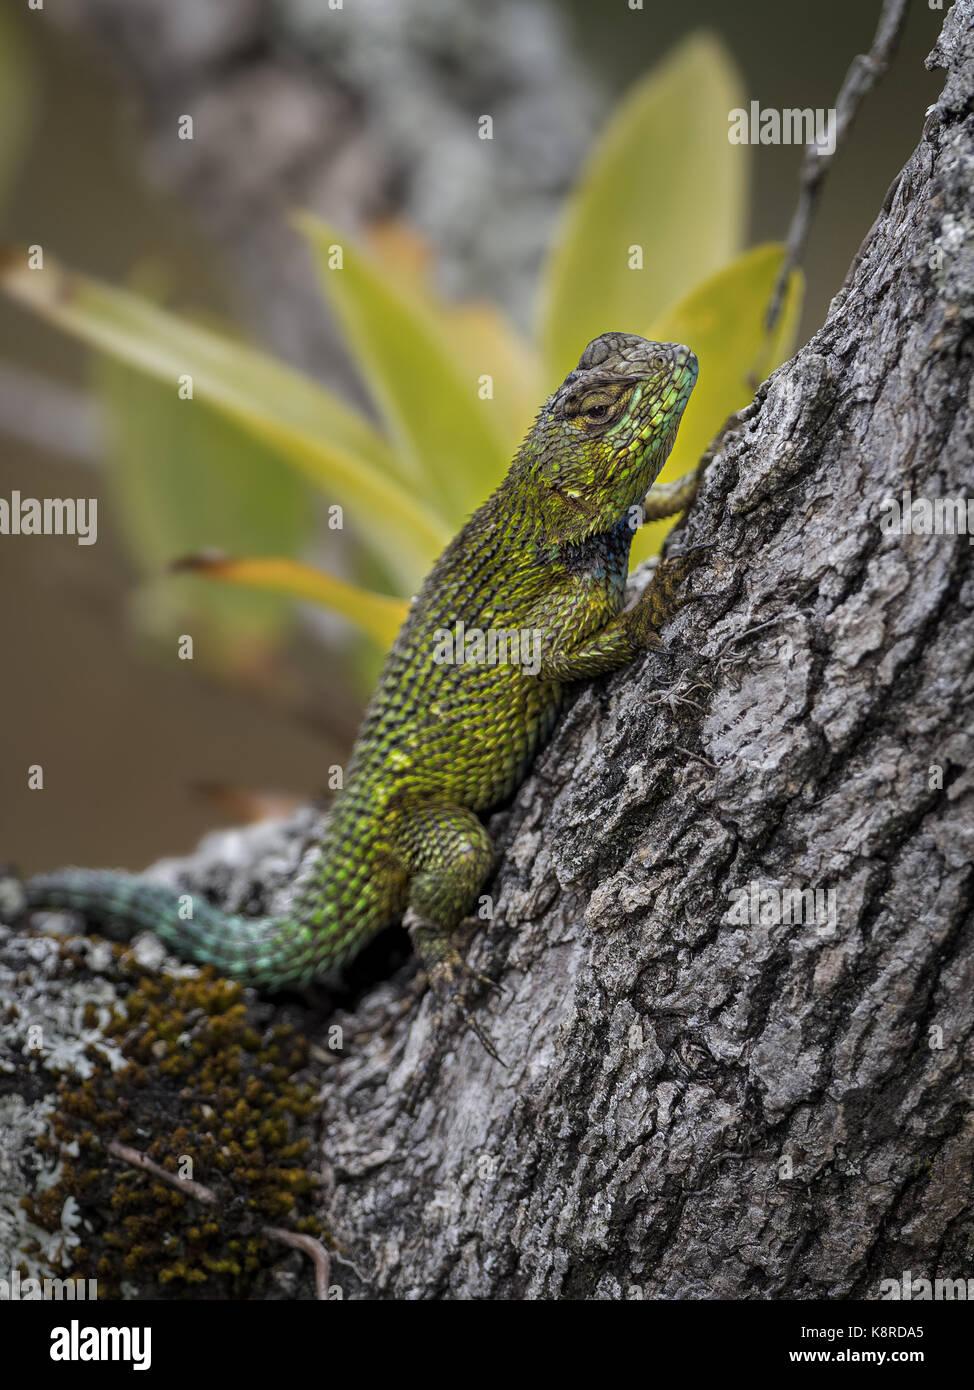 Emerald Swift Lizard (Sceloporus malachiticus), männlich, Chiriqui, Panama, März Stockbild